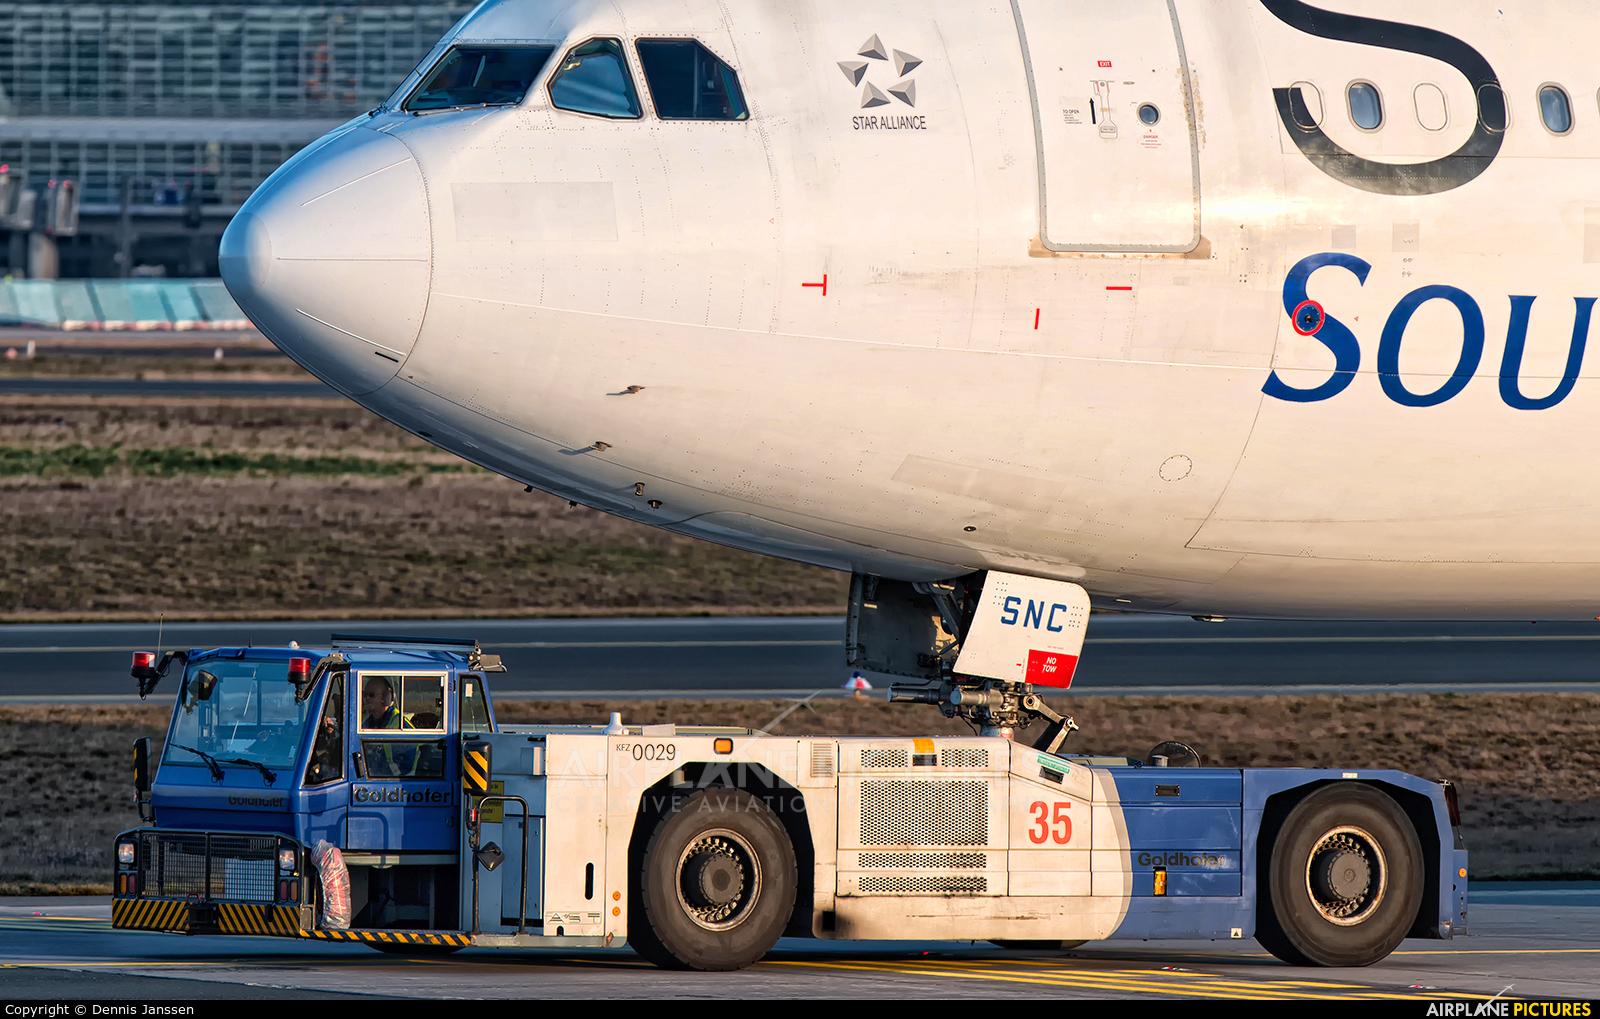 South African Airways ZS-SNC aircraft at Frankfurt